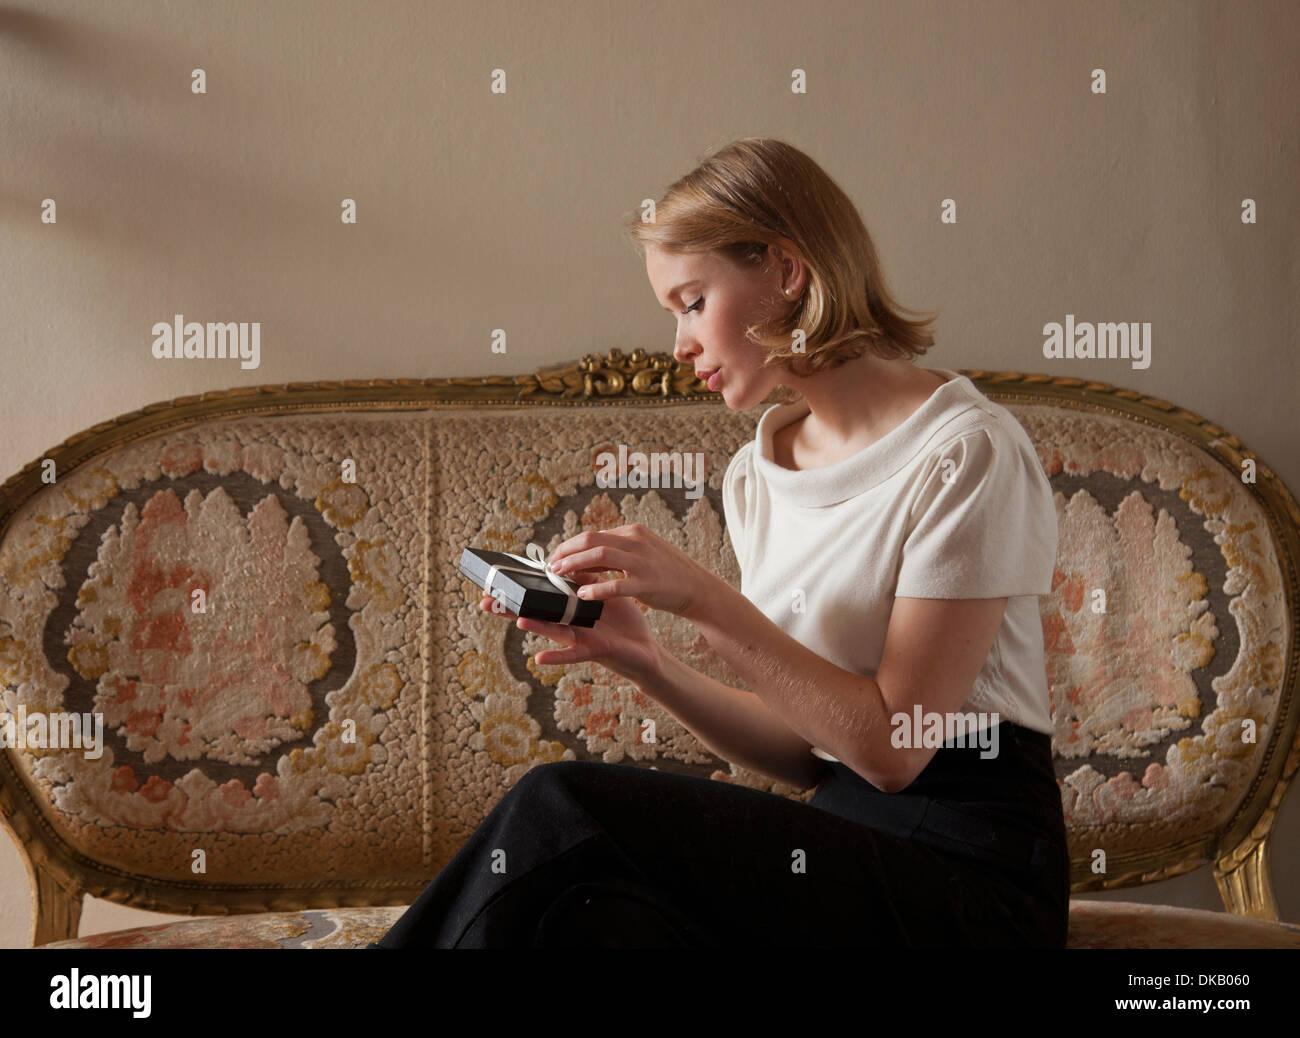 Mujer regalo de apertura Imagen De Stock